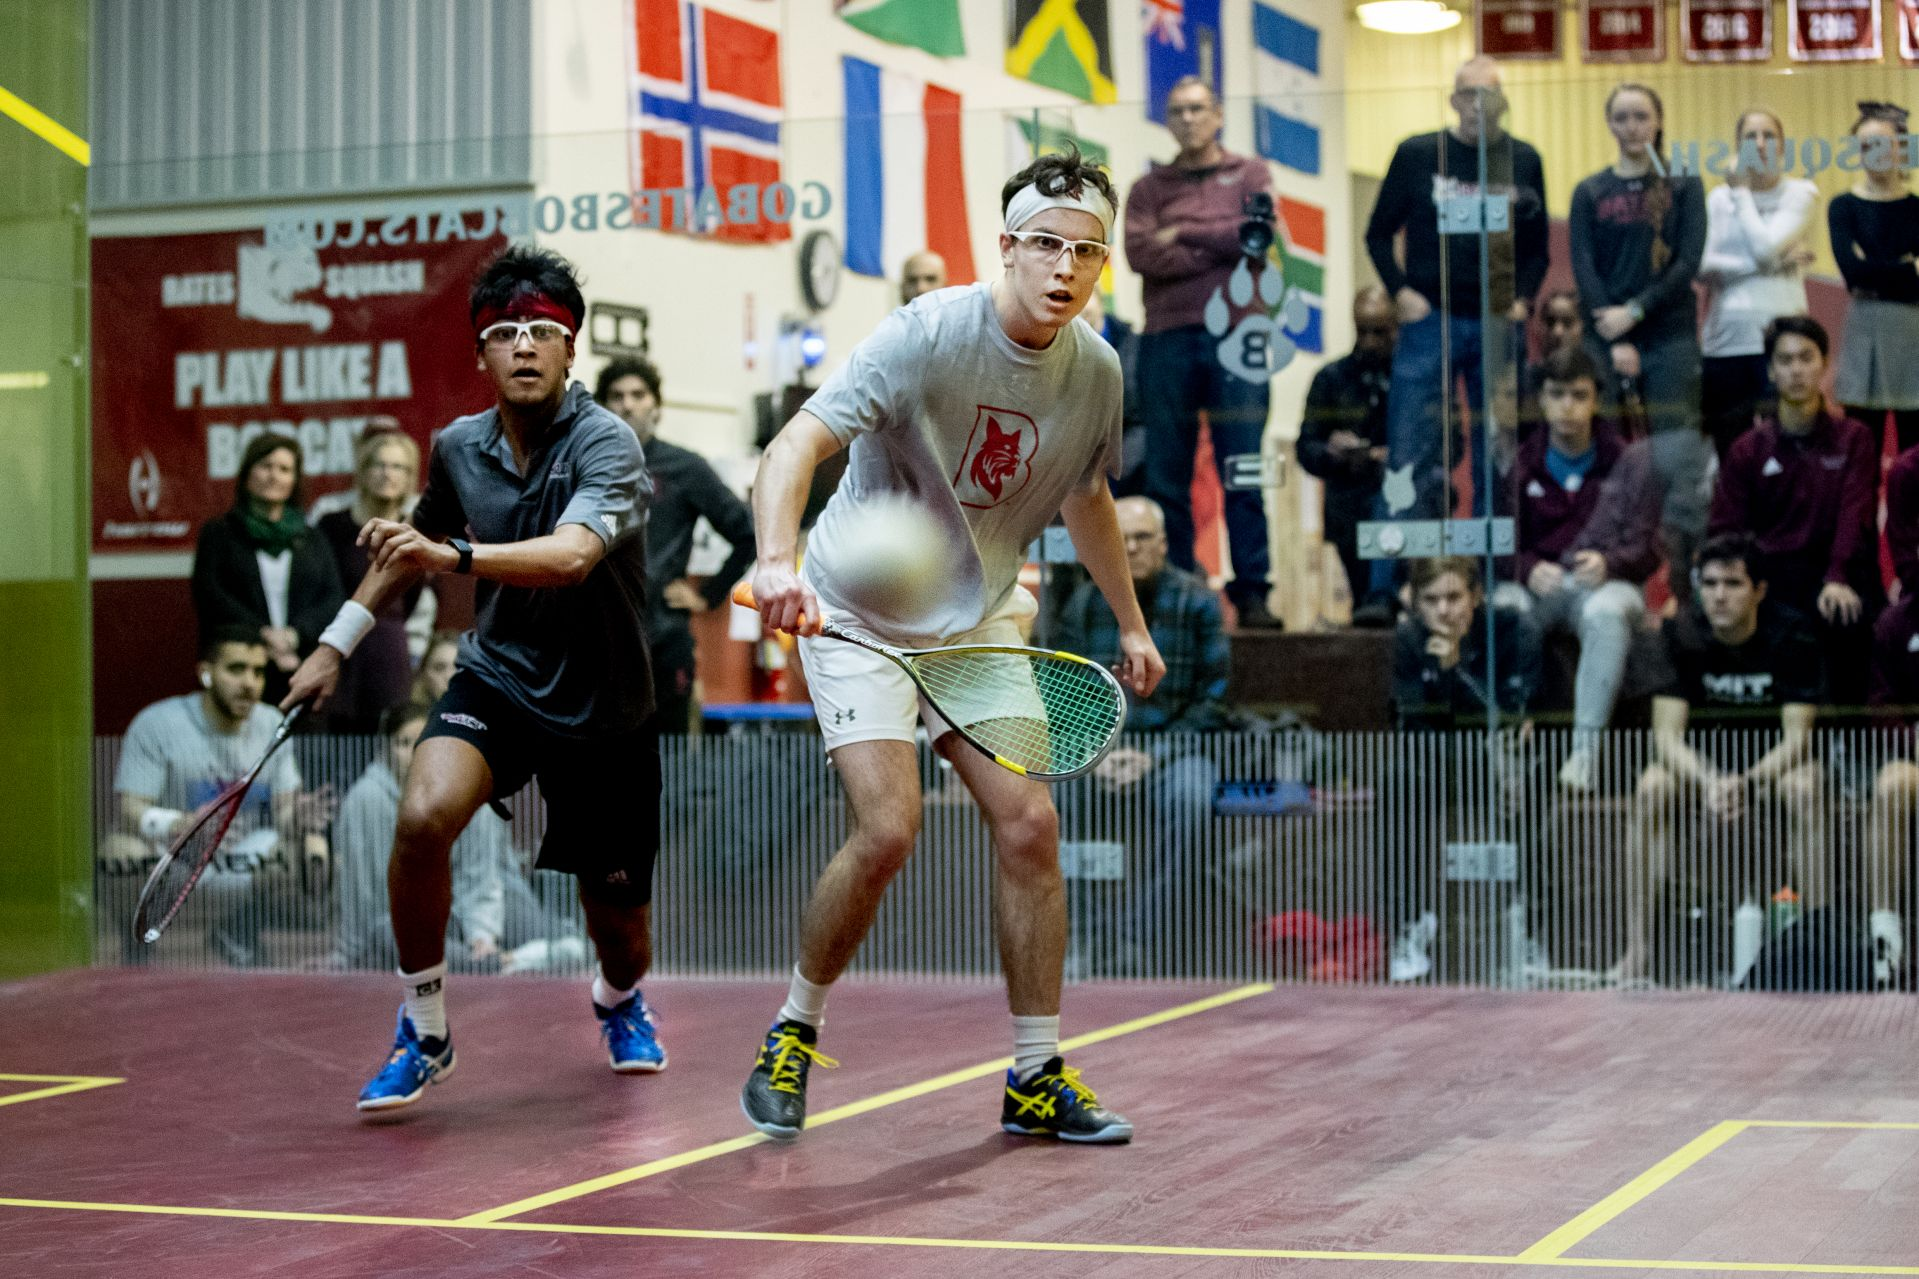 MIT men's squash defeats Bates men's squash 6-0 in home match.